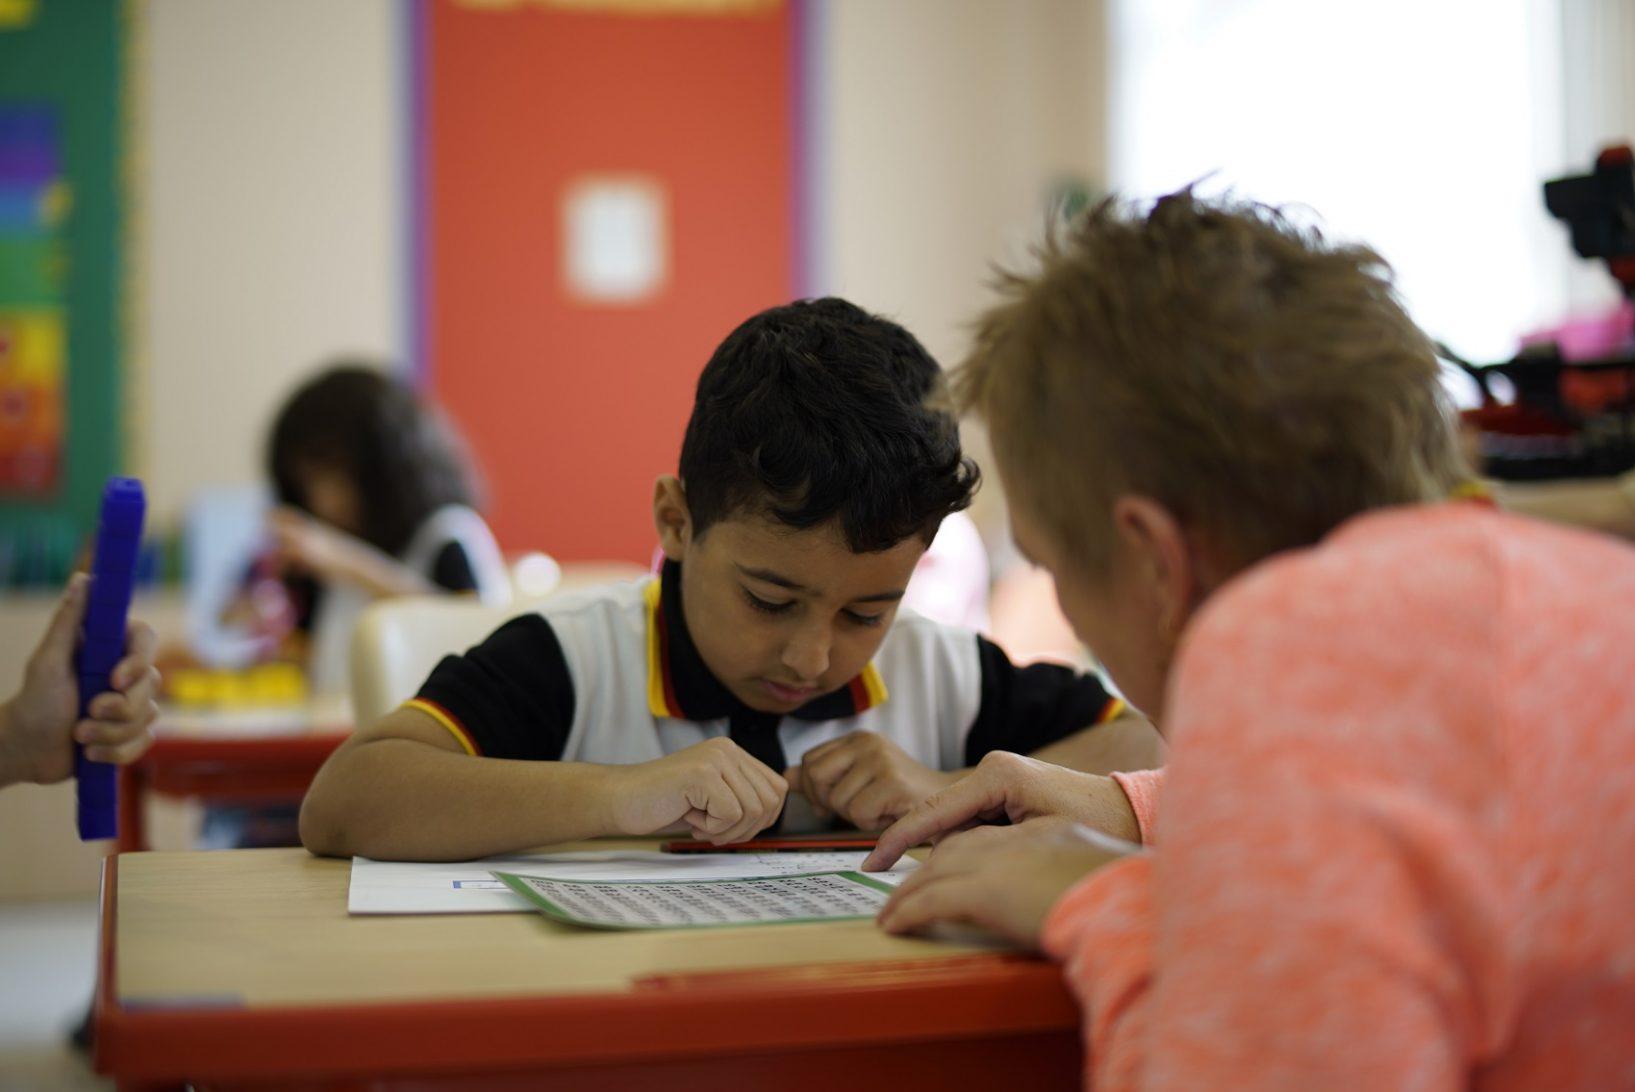 Dubai's Private Schools Raked In $2 Billion As Fees In 2017-2018